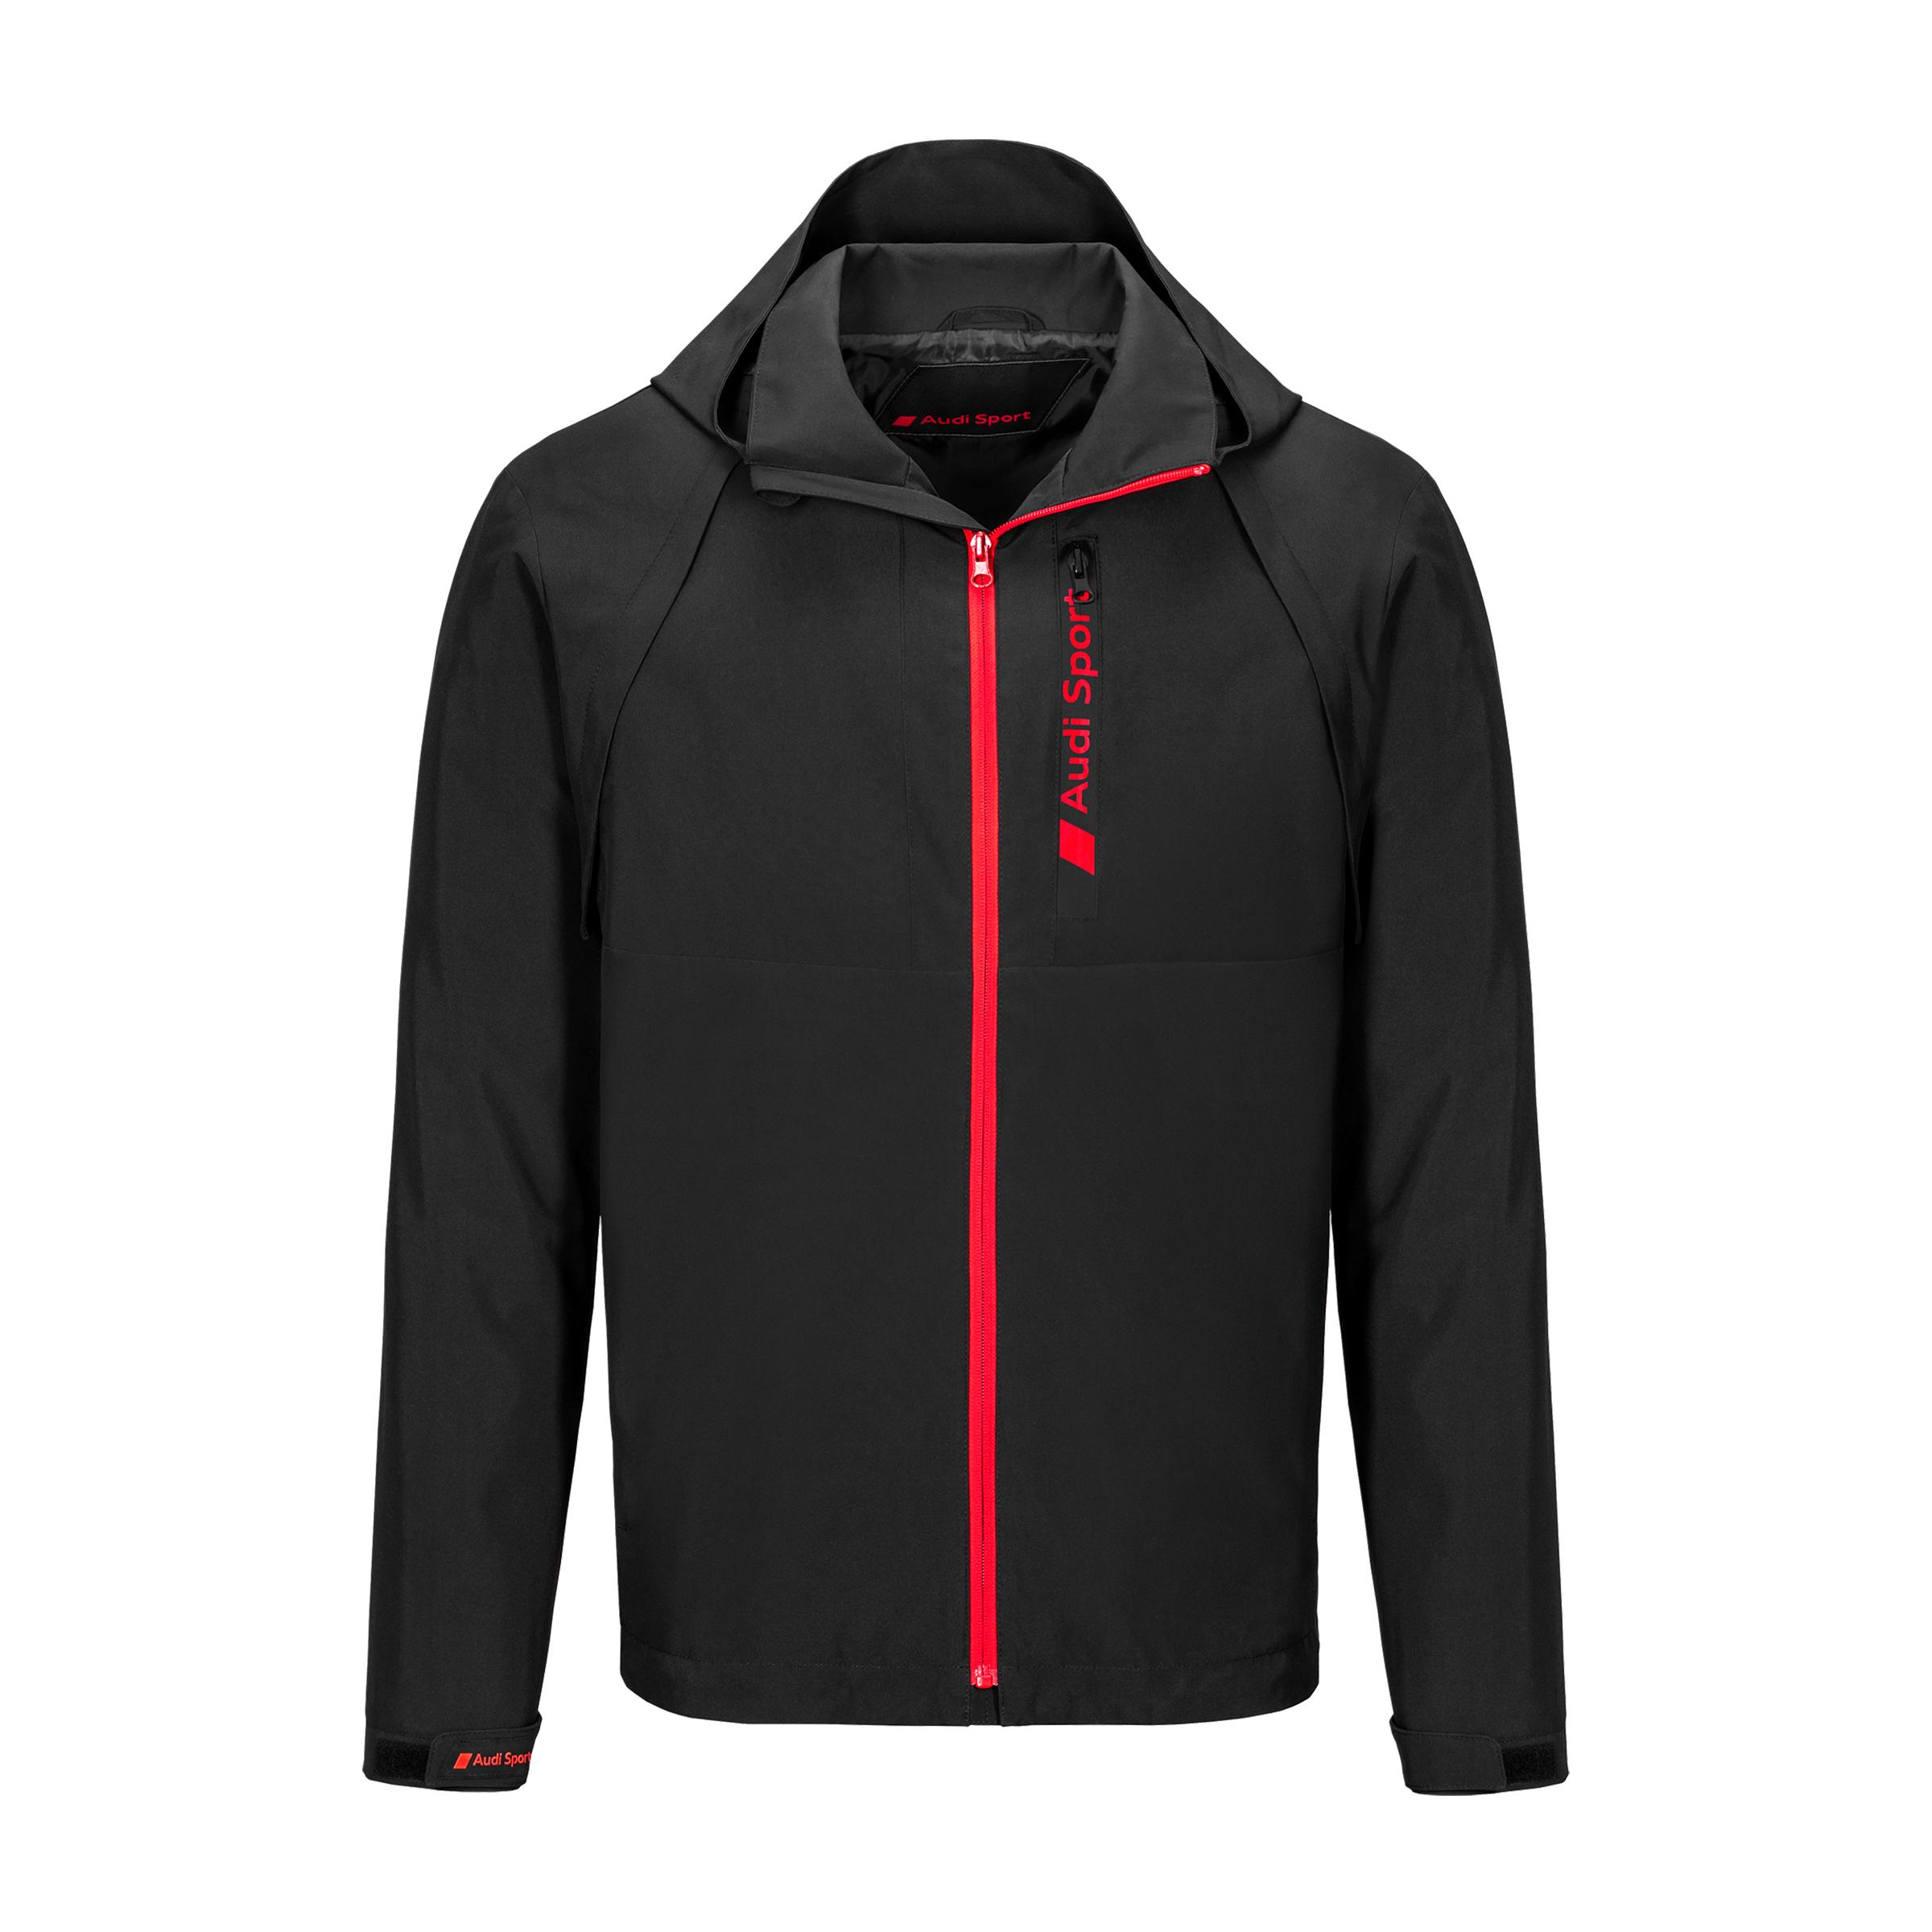 Audi Sport Zipoffjacke Herren Größe M schwarz Jacke